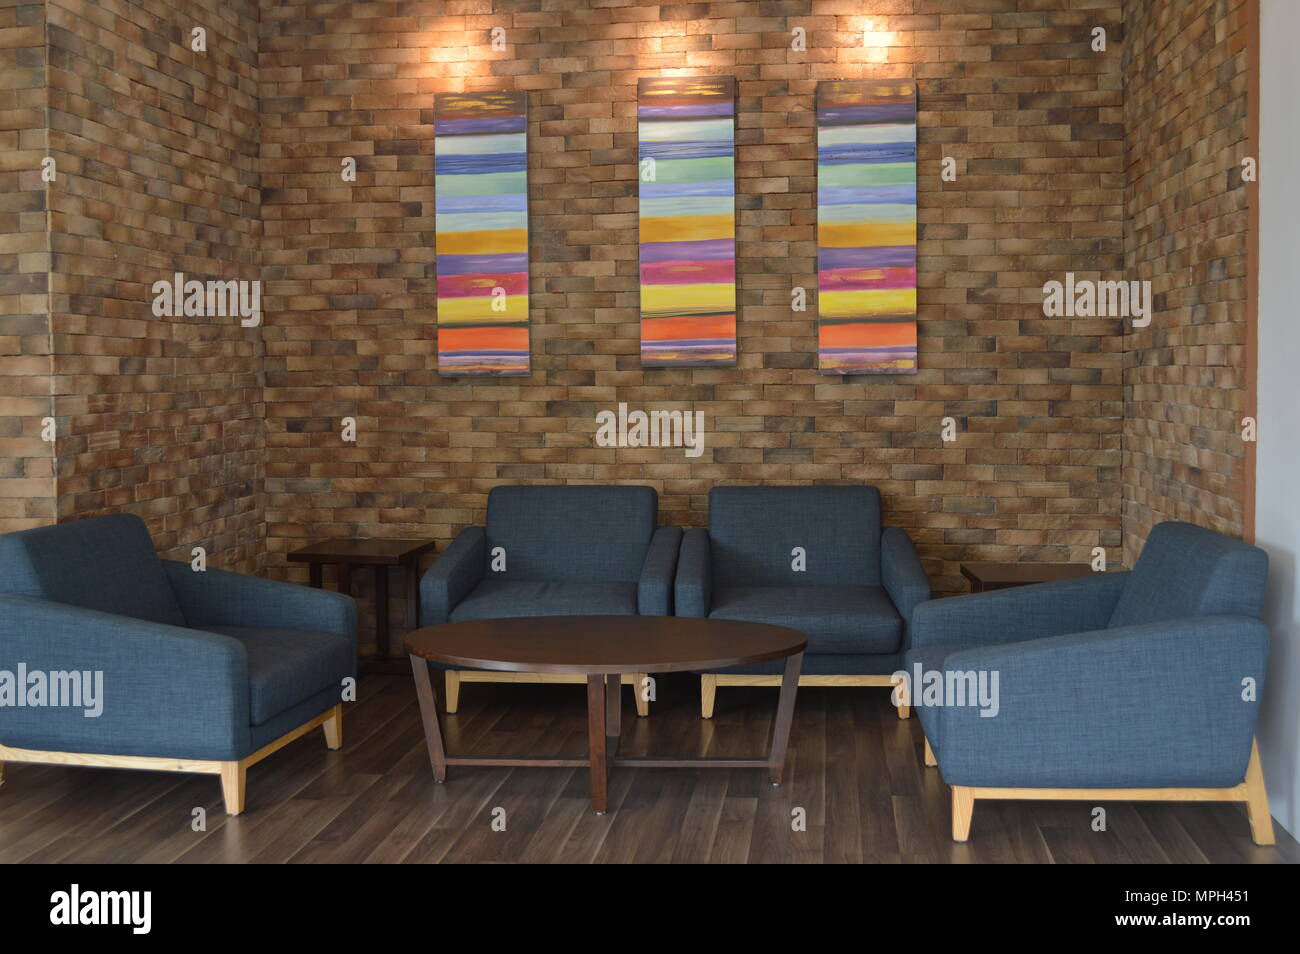 Büro Wohnzimmer Stockfoto, Bild: 186002573 - Alamy